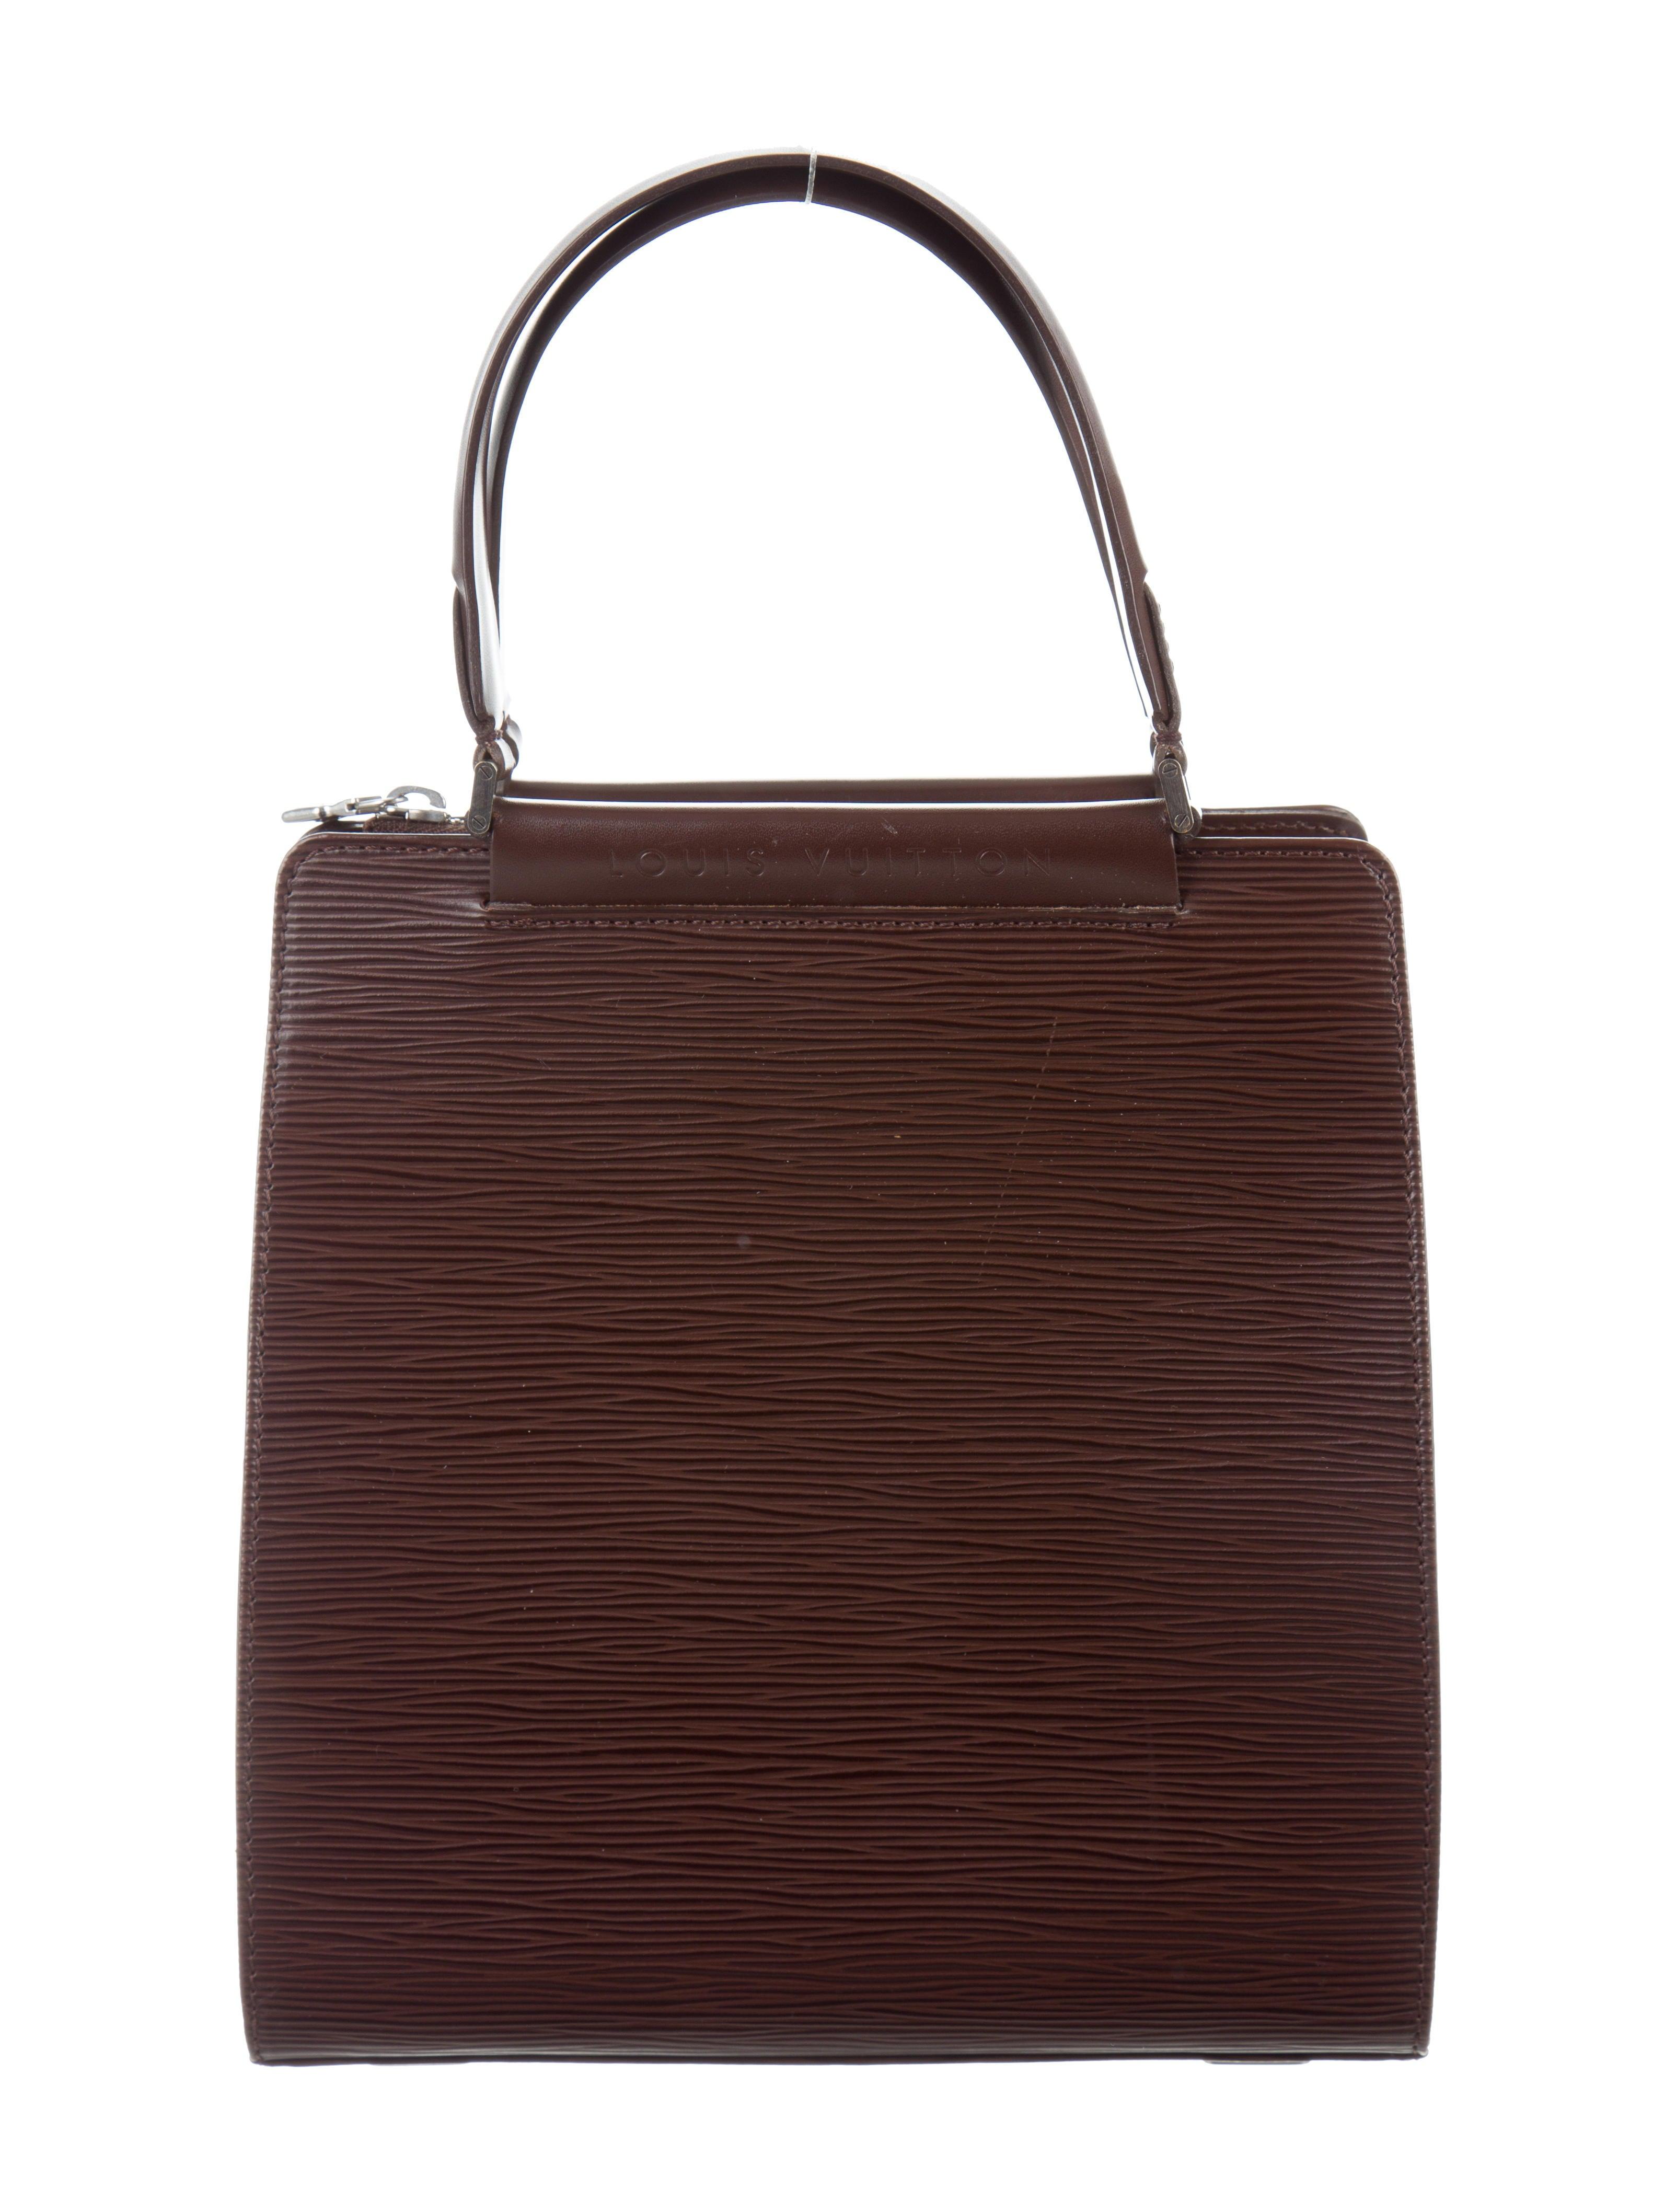 Louis Vuitton Figari Handbag Epi Leather Pm azjNM1xIz